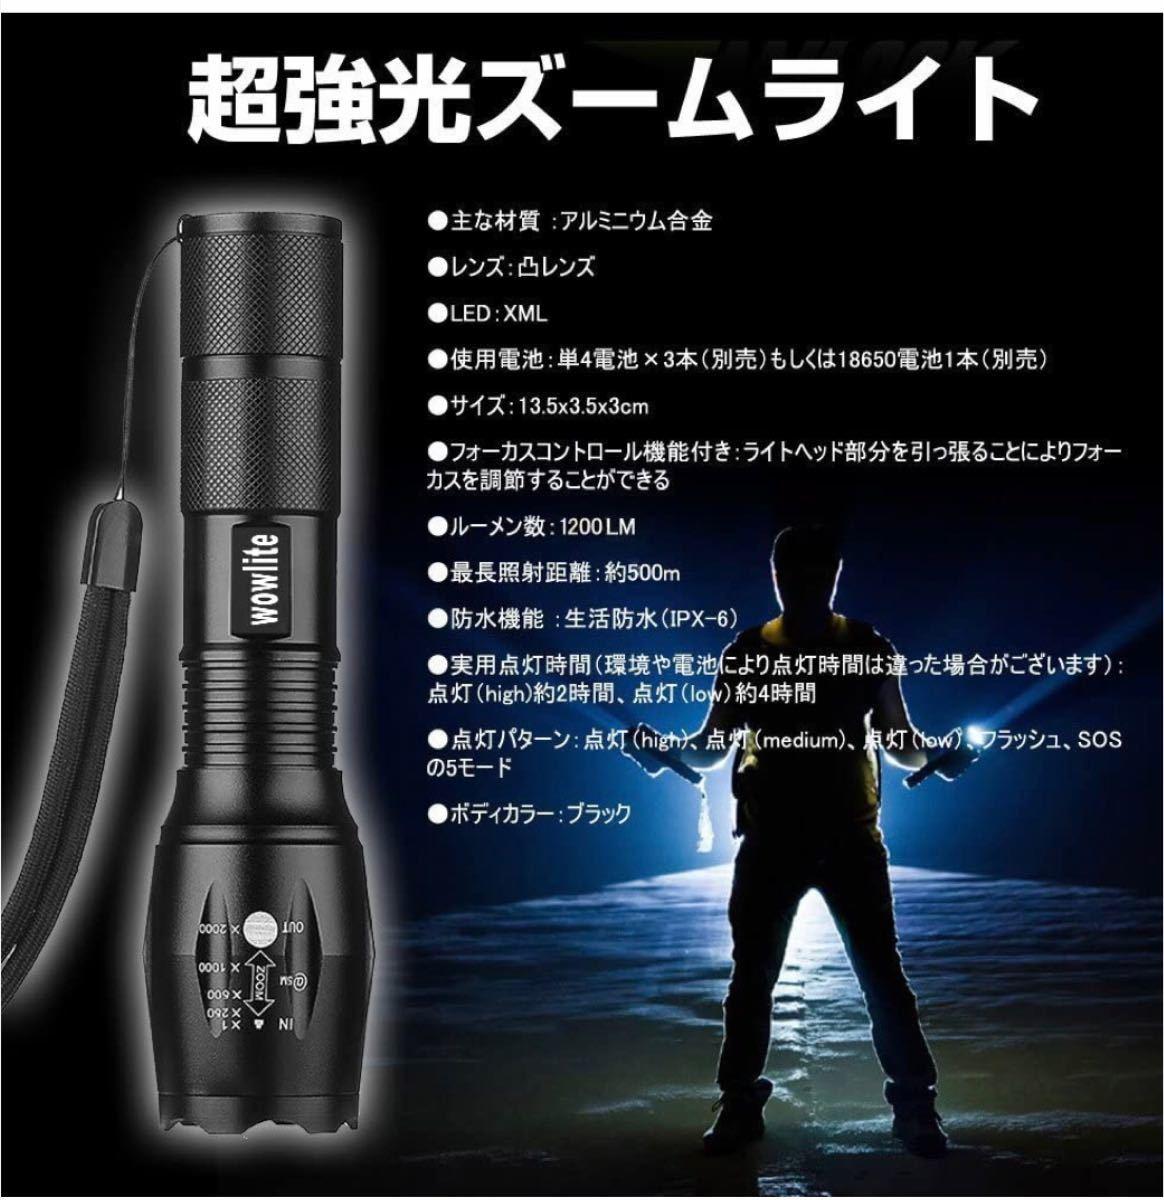 LED懐中電灯 ハンディライト 2本セット 高輝度 5種類のモード調光 防水、優れた耐久性